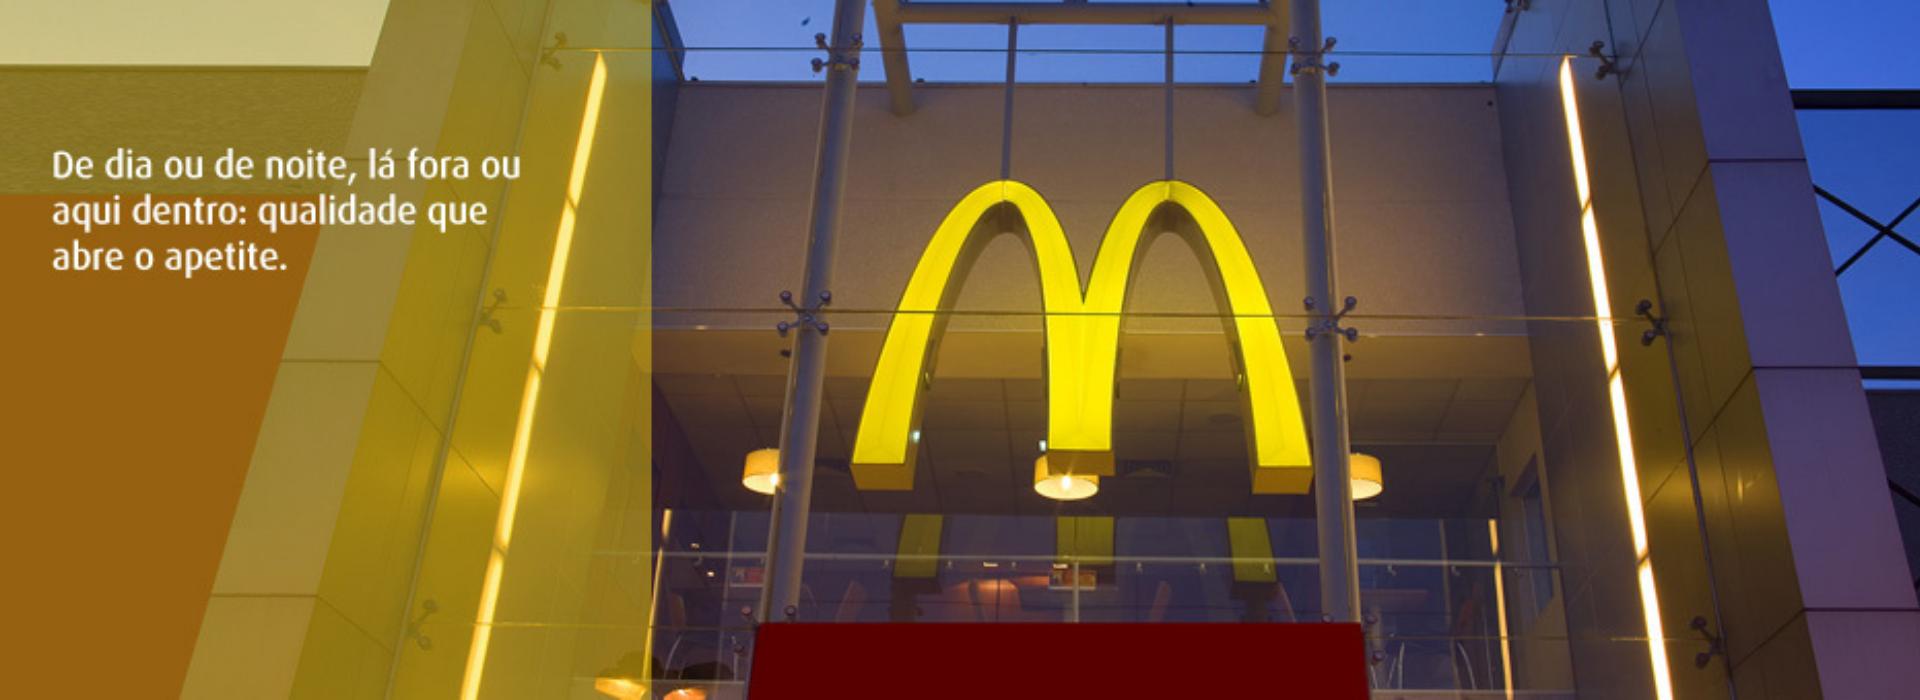 Banner MacDonalds